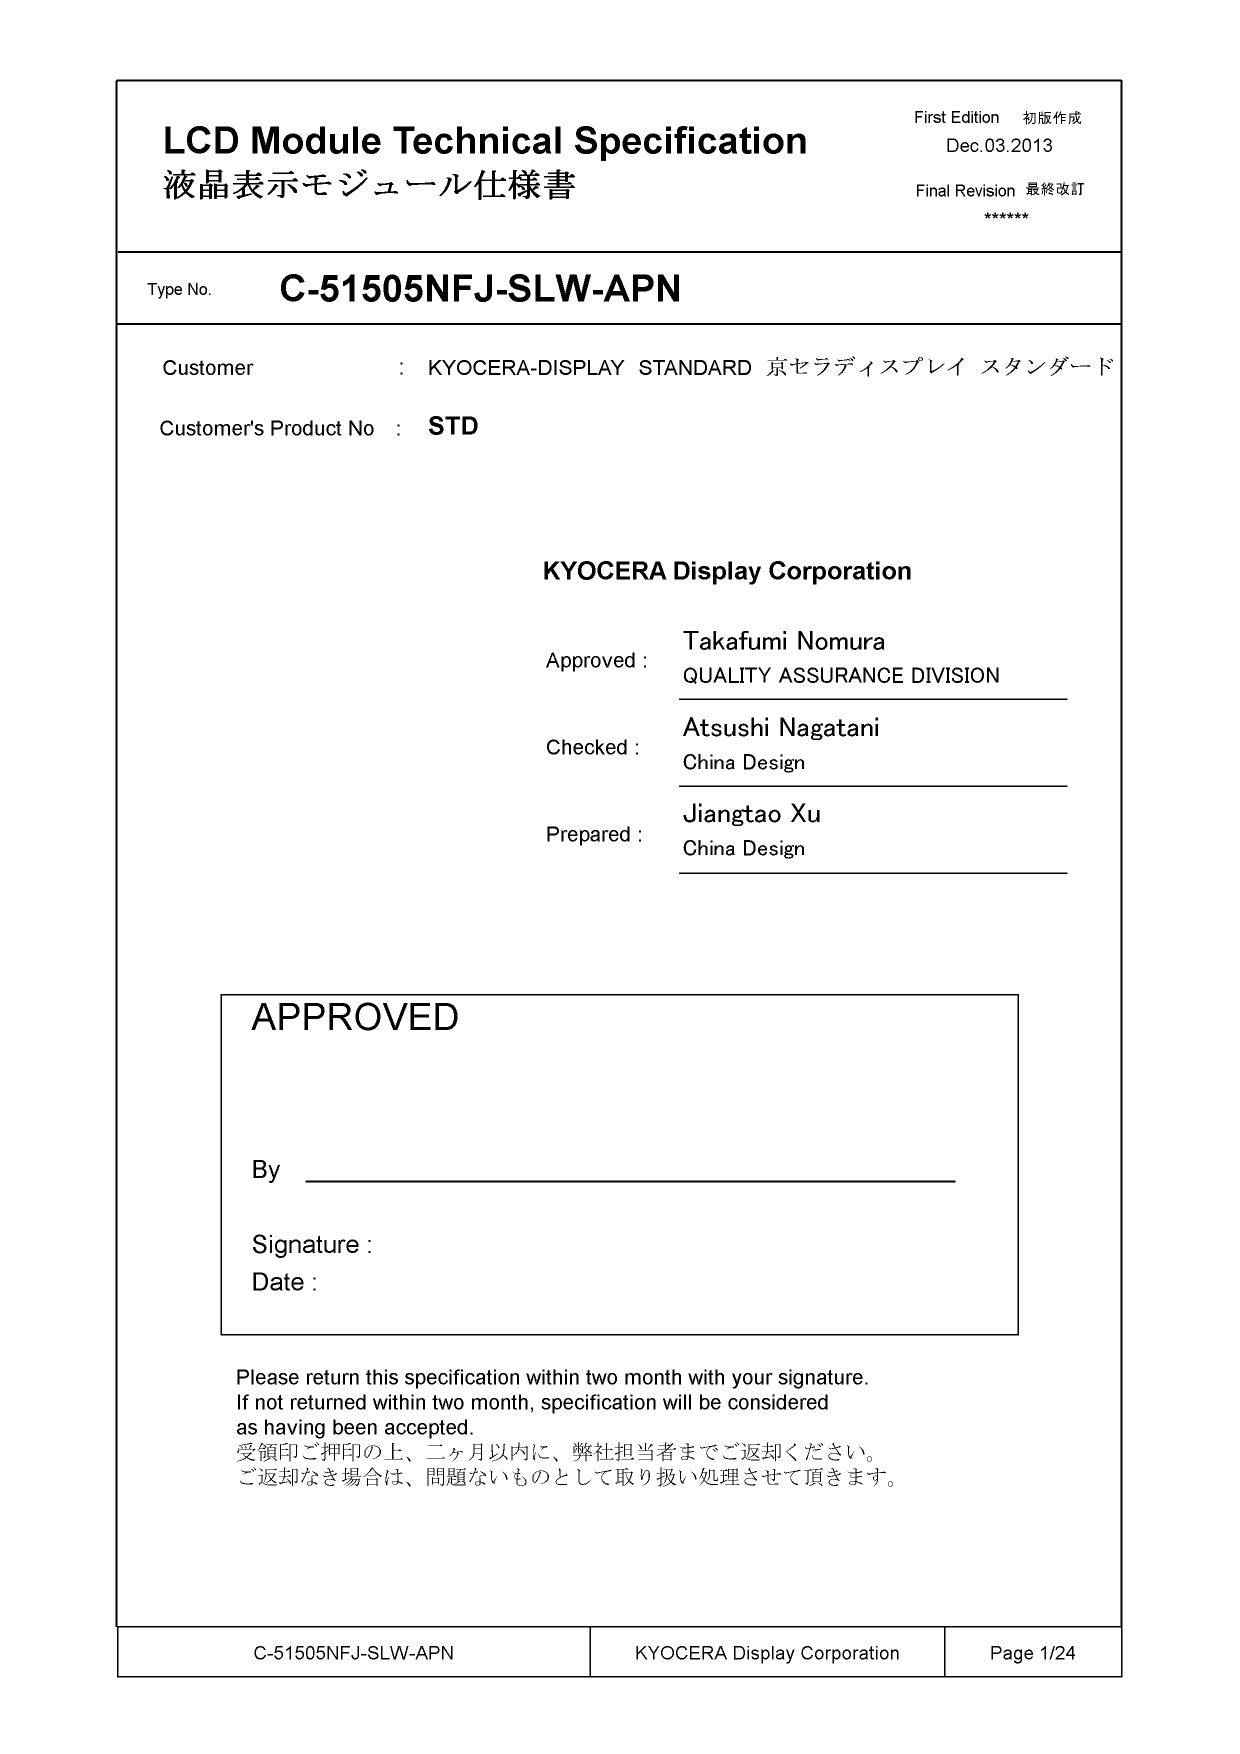 C-51505NFJ-SLW-APN datasheet